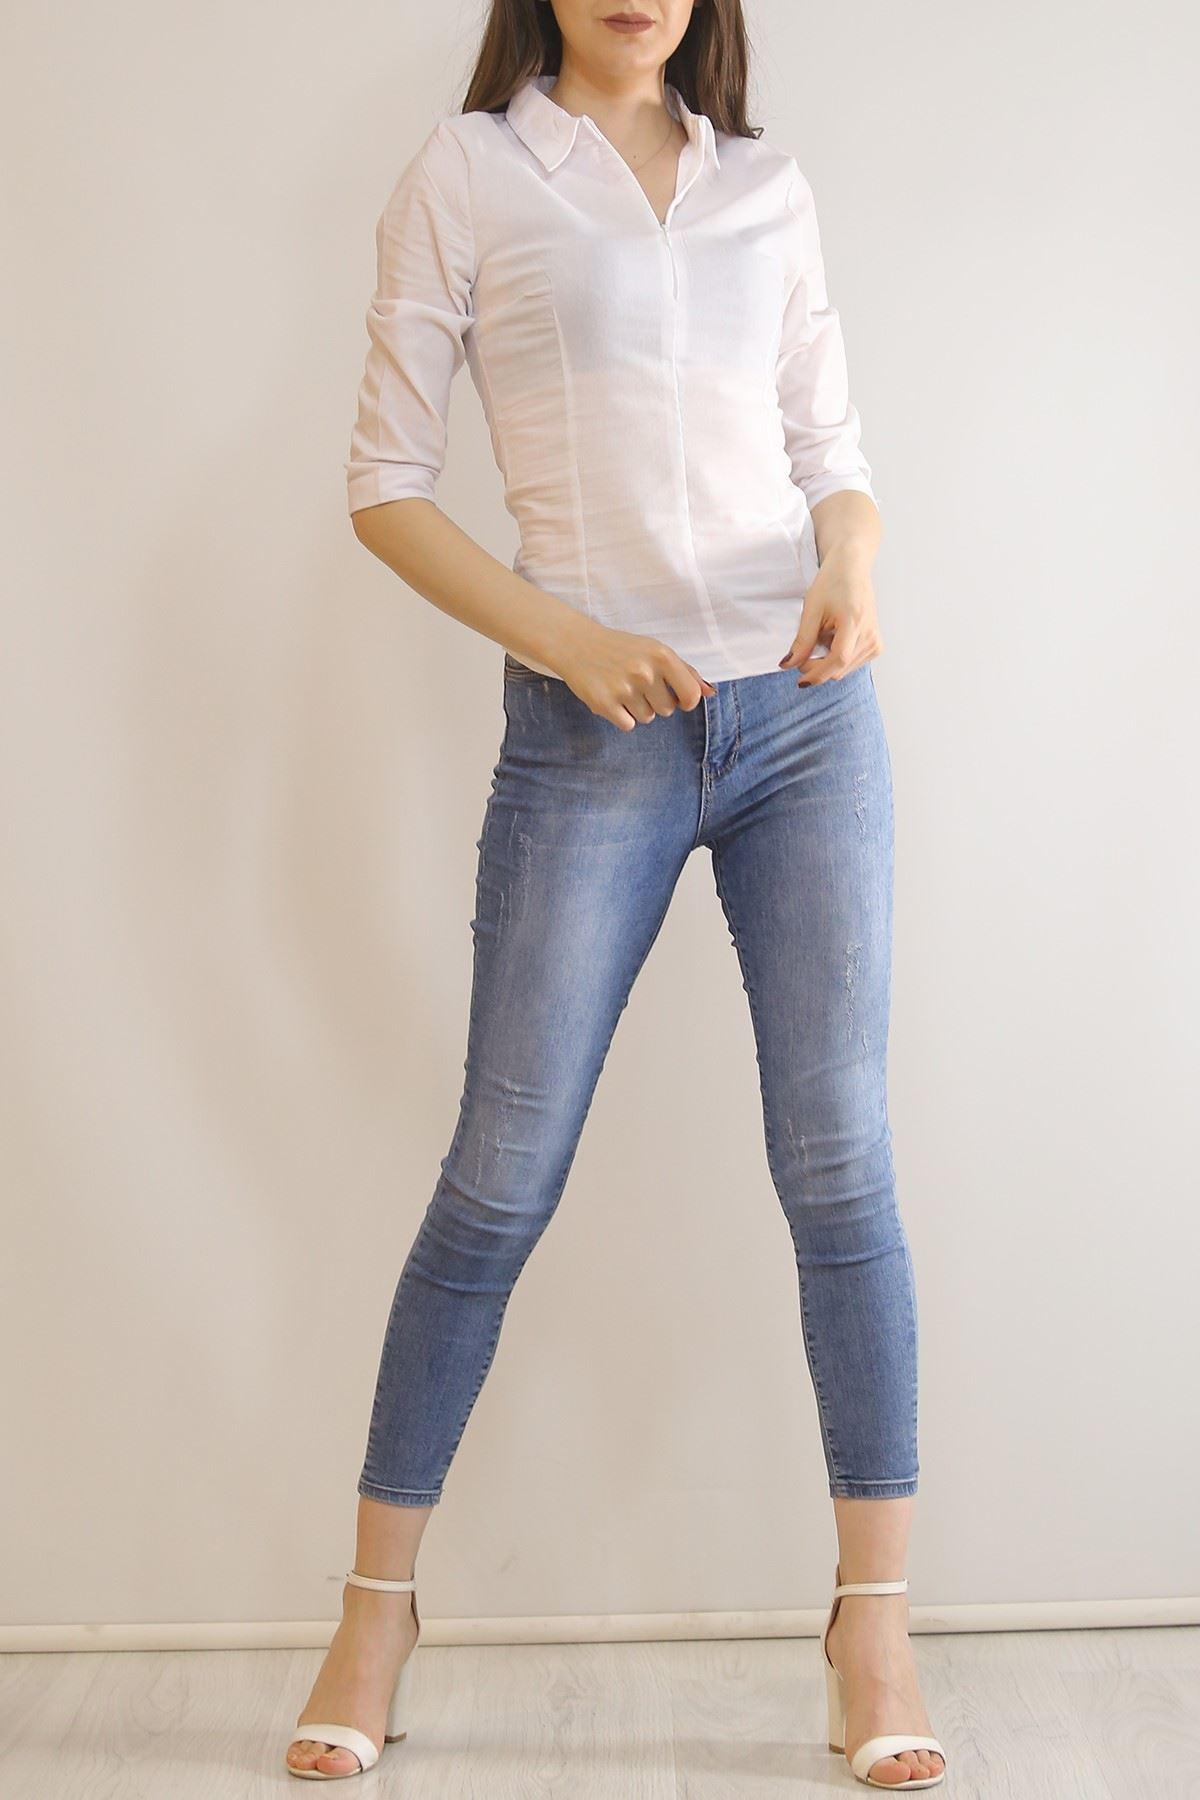 Likralı Slim Fit Gömlek Beyaz - 2315.159.